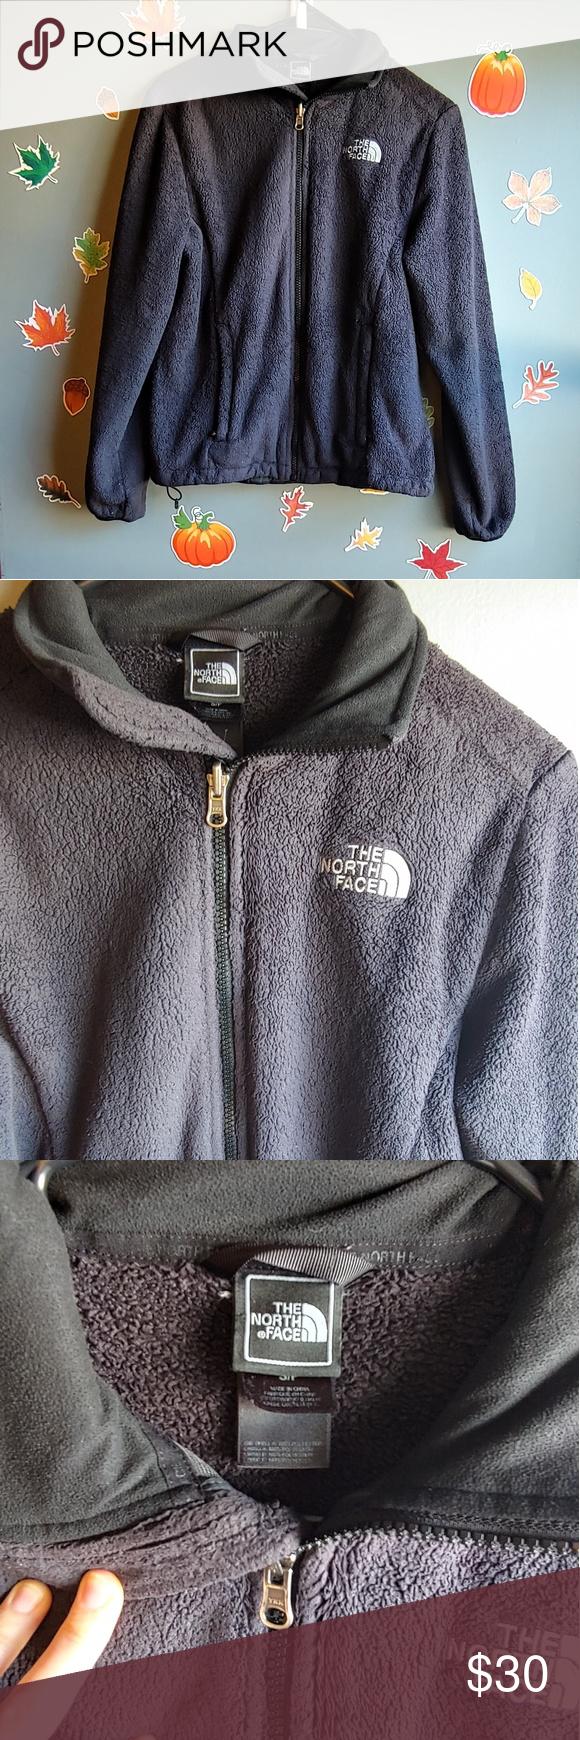 The North Face Fleece North Face Fleece Black North Face Clothes Design [ 1740 x 580 Pixel ]